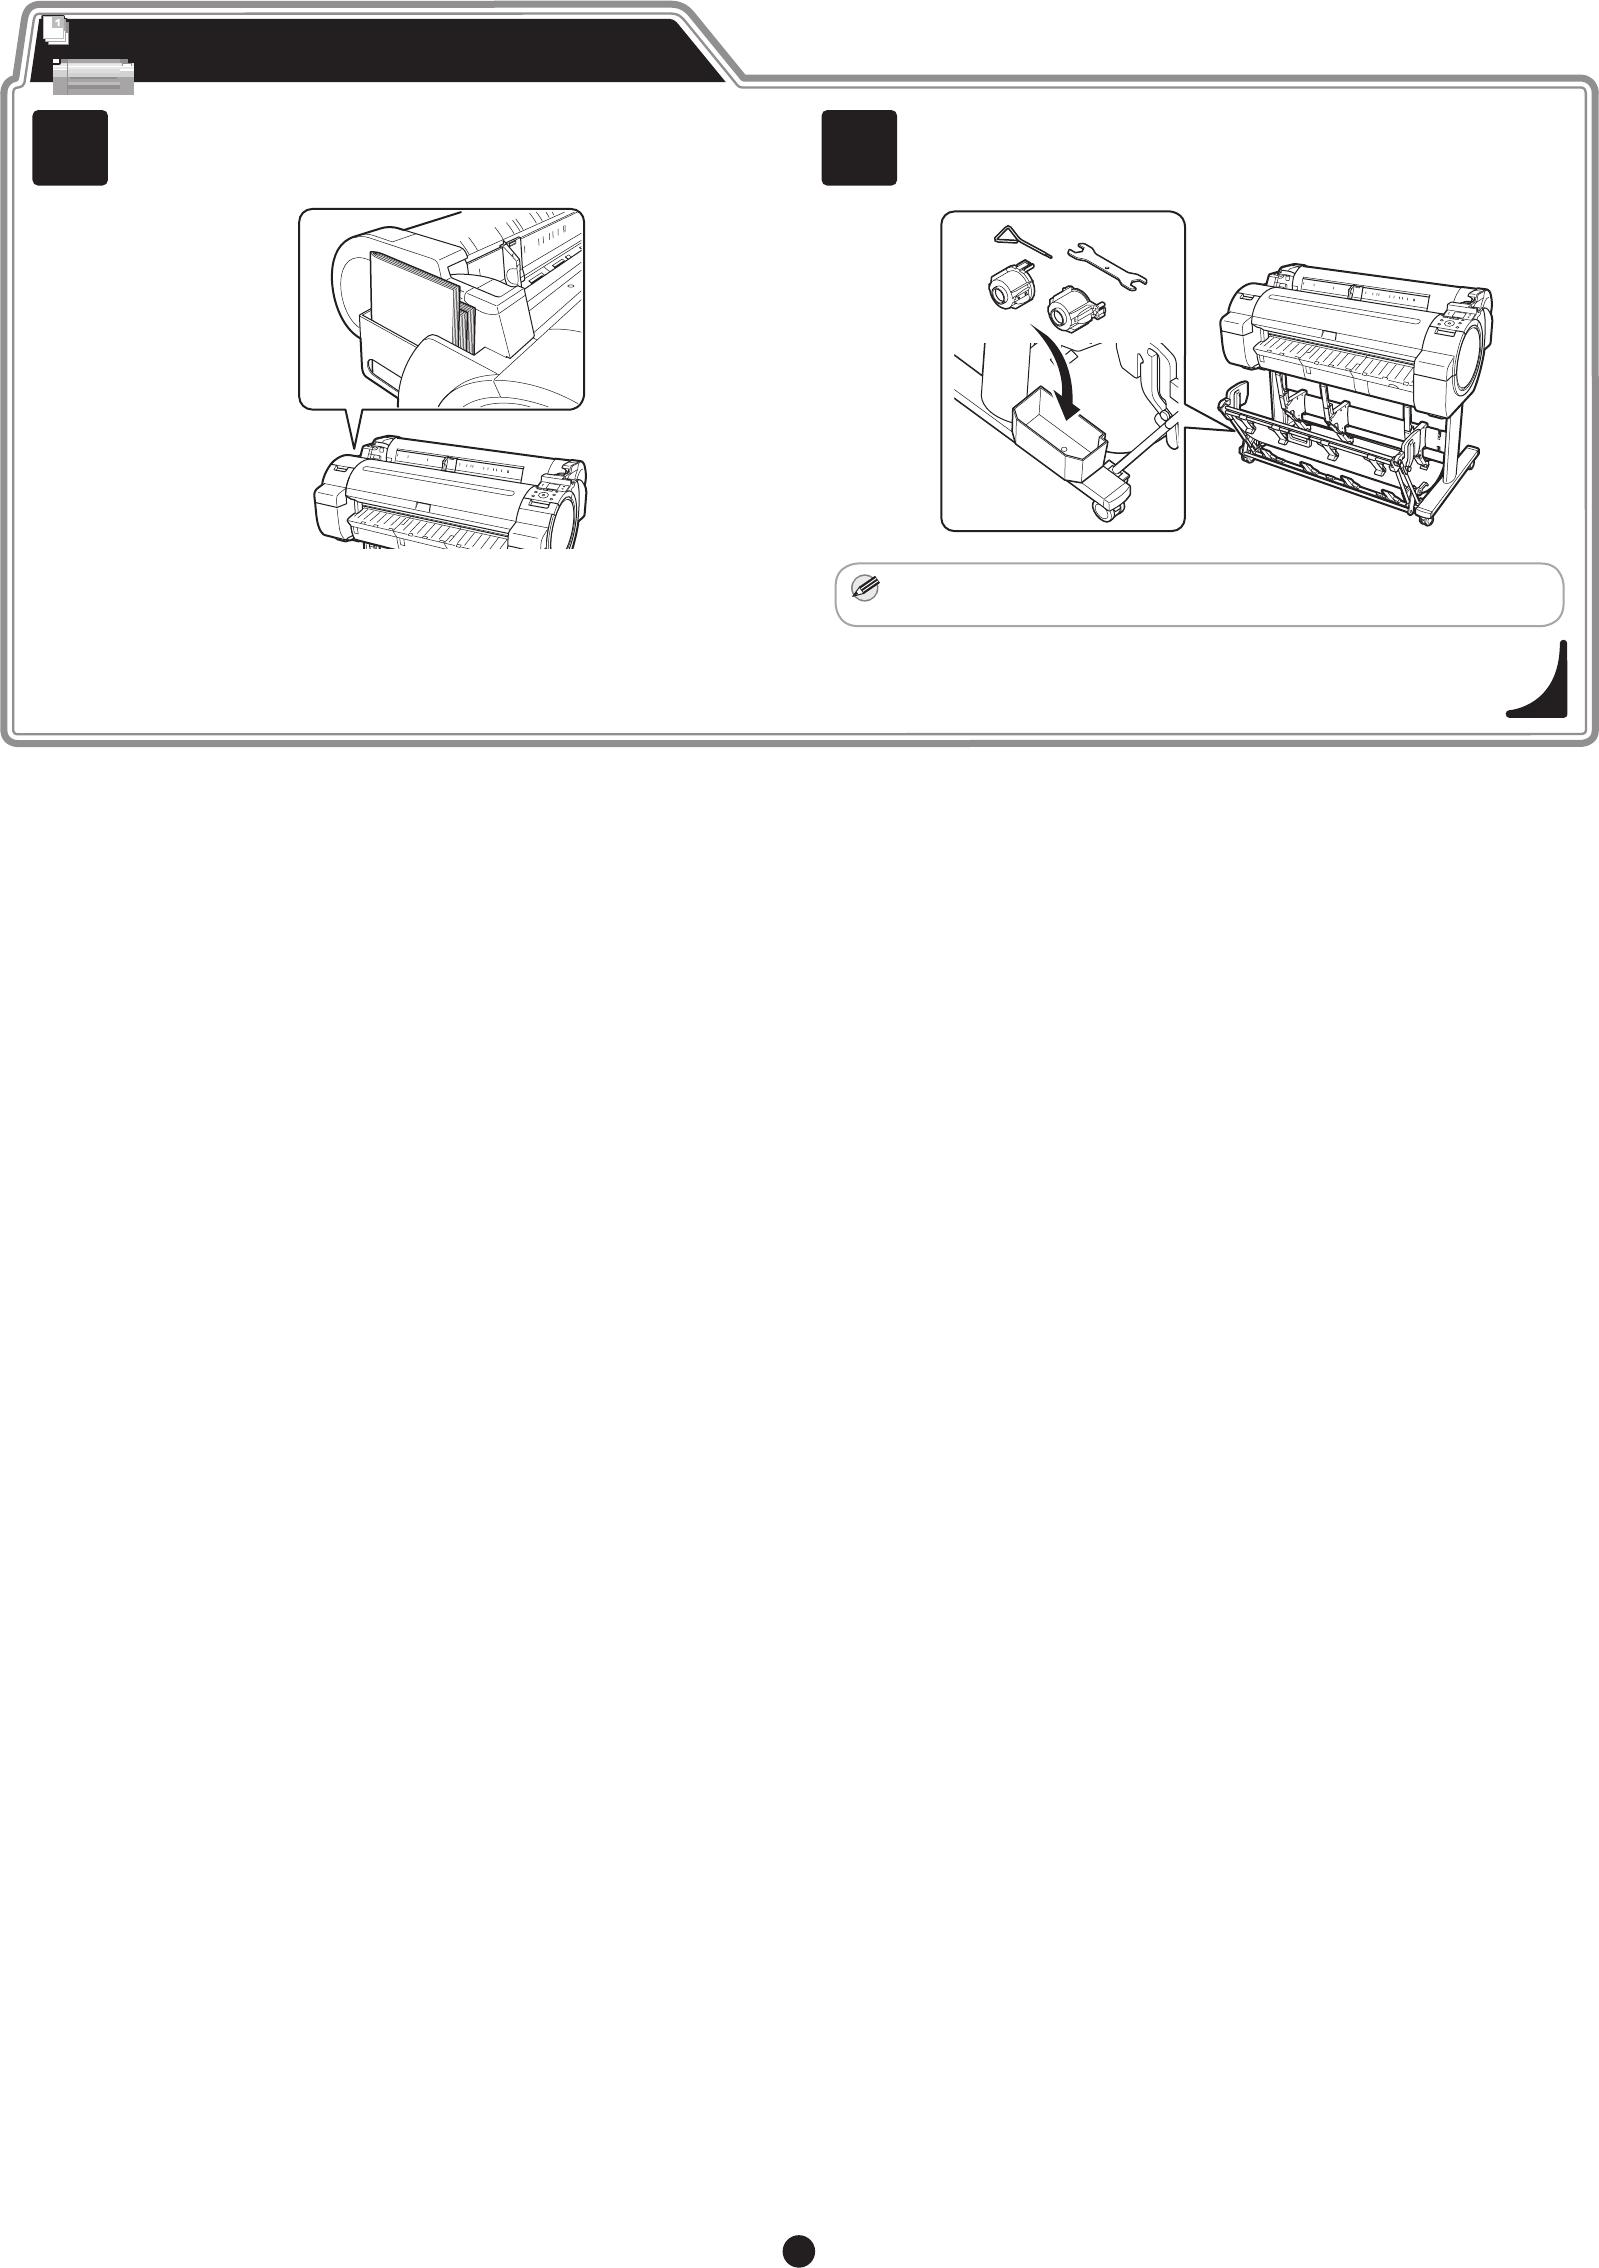 Canon Imageprograf Ipf770 Setup Guide IPF770/iPF670